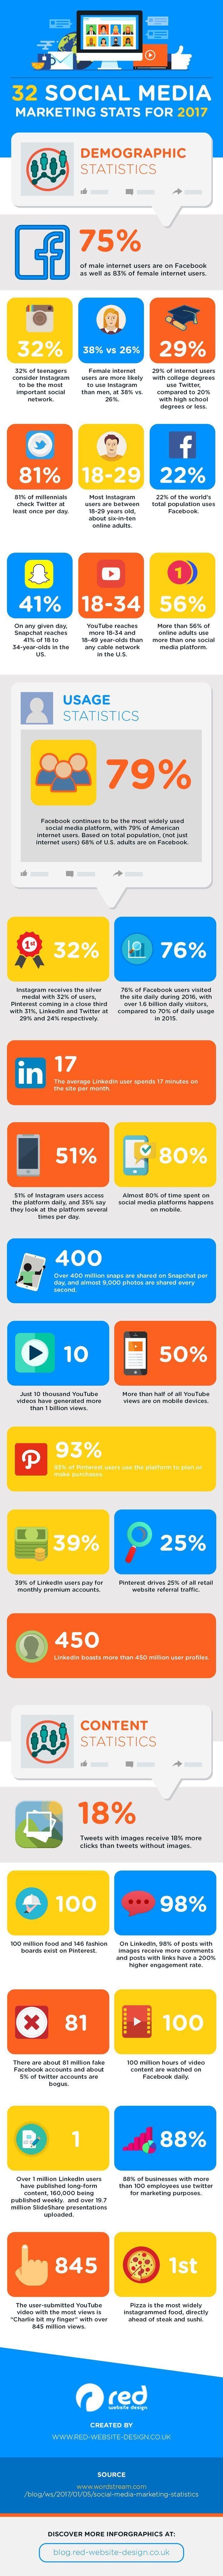 30+ Essential Social Media Marketing Statistics for 2017 - infographic Find more stuff: dynamicwebmarketi... http://itz-my.com